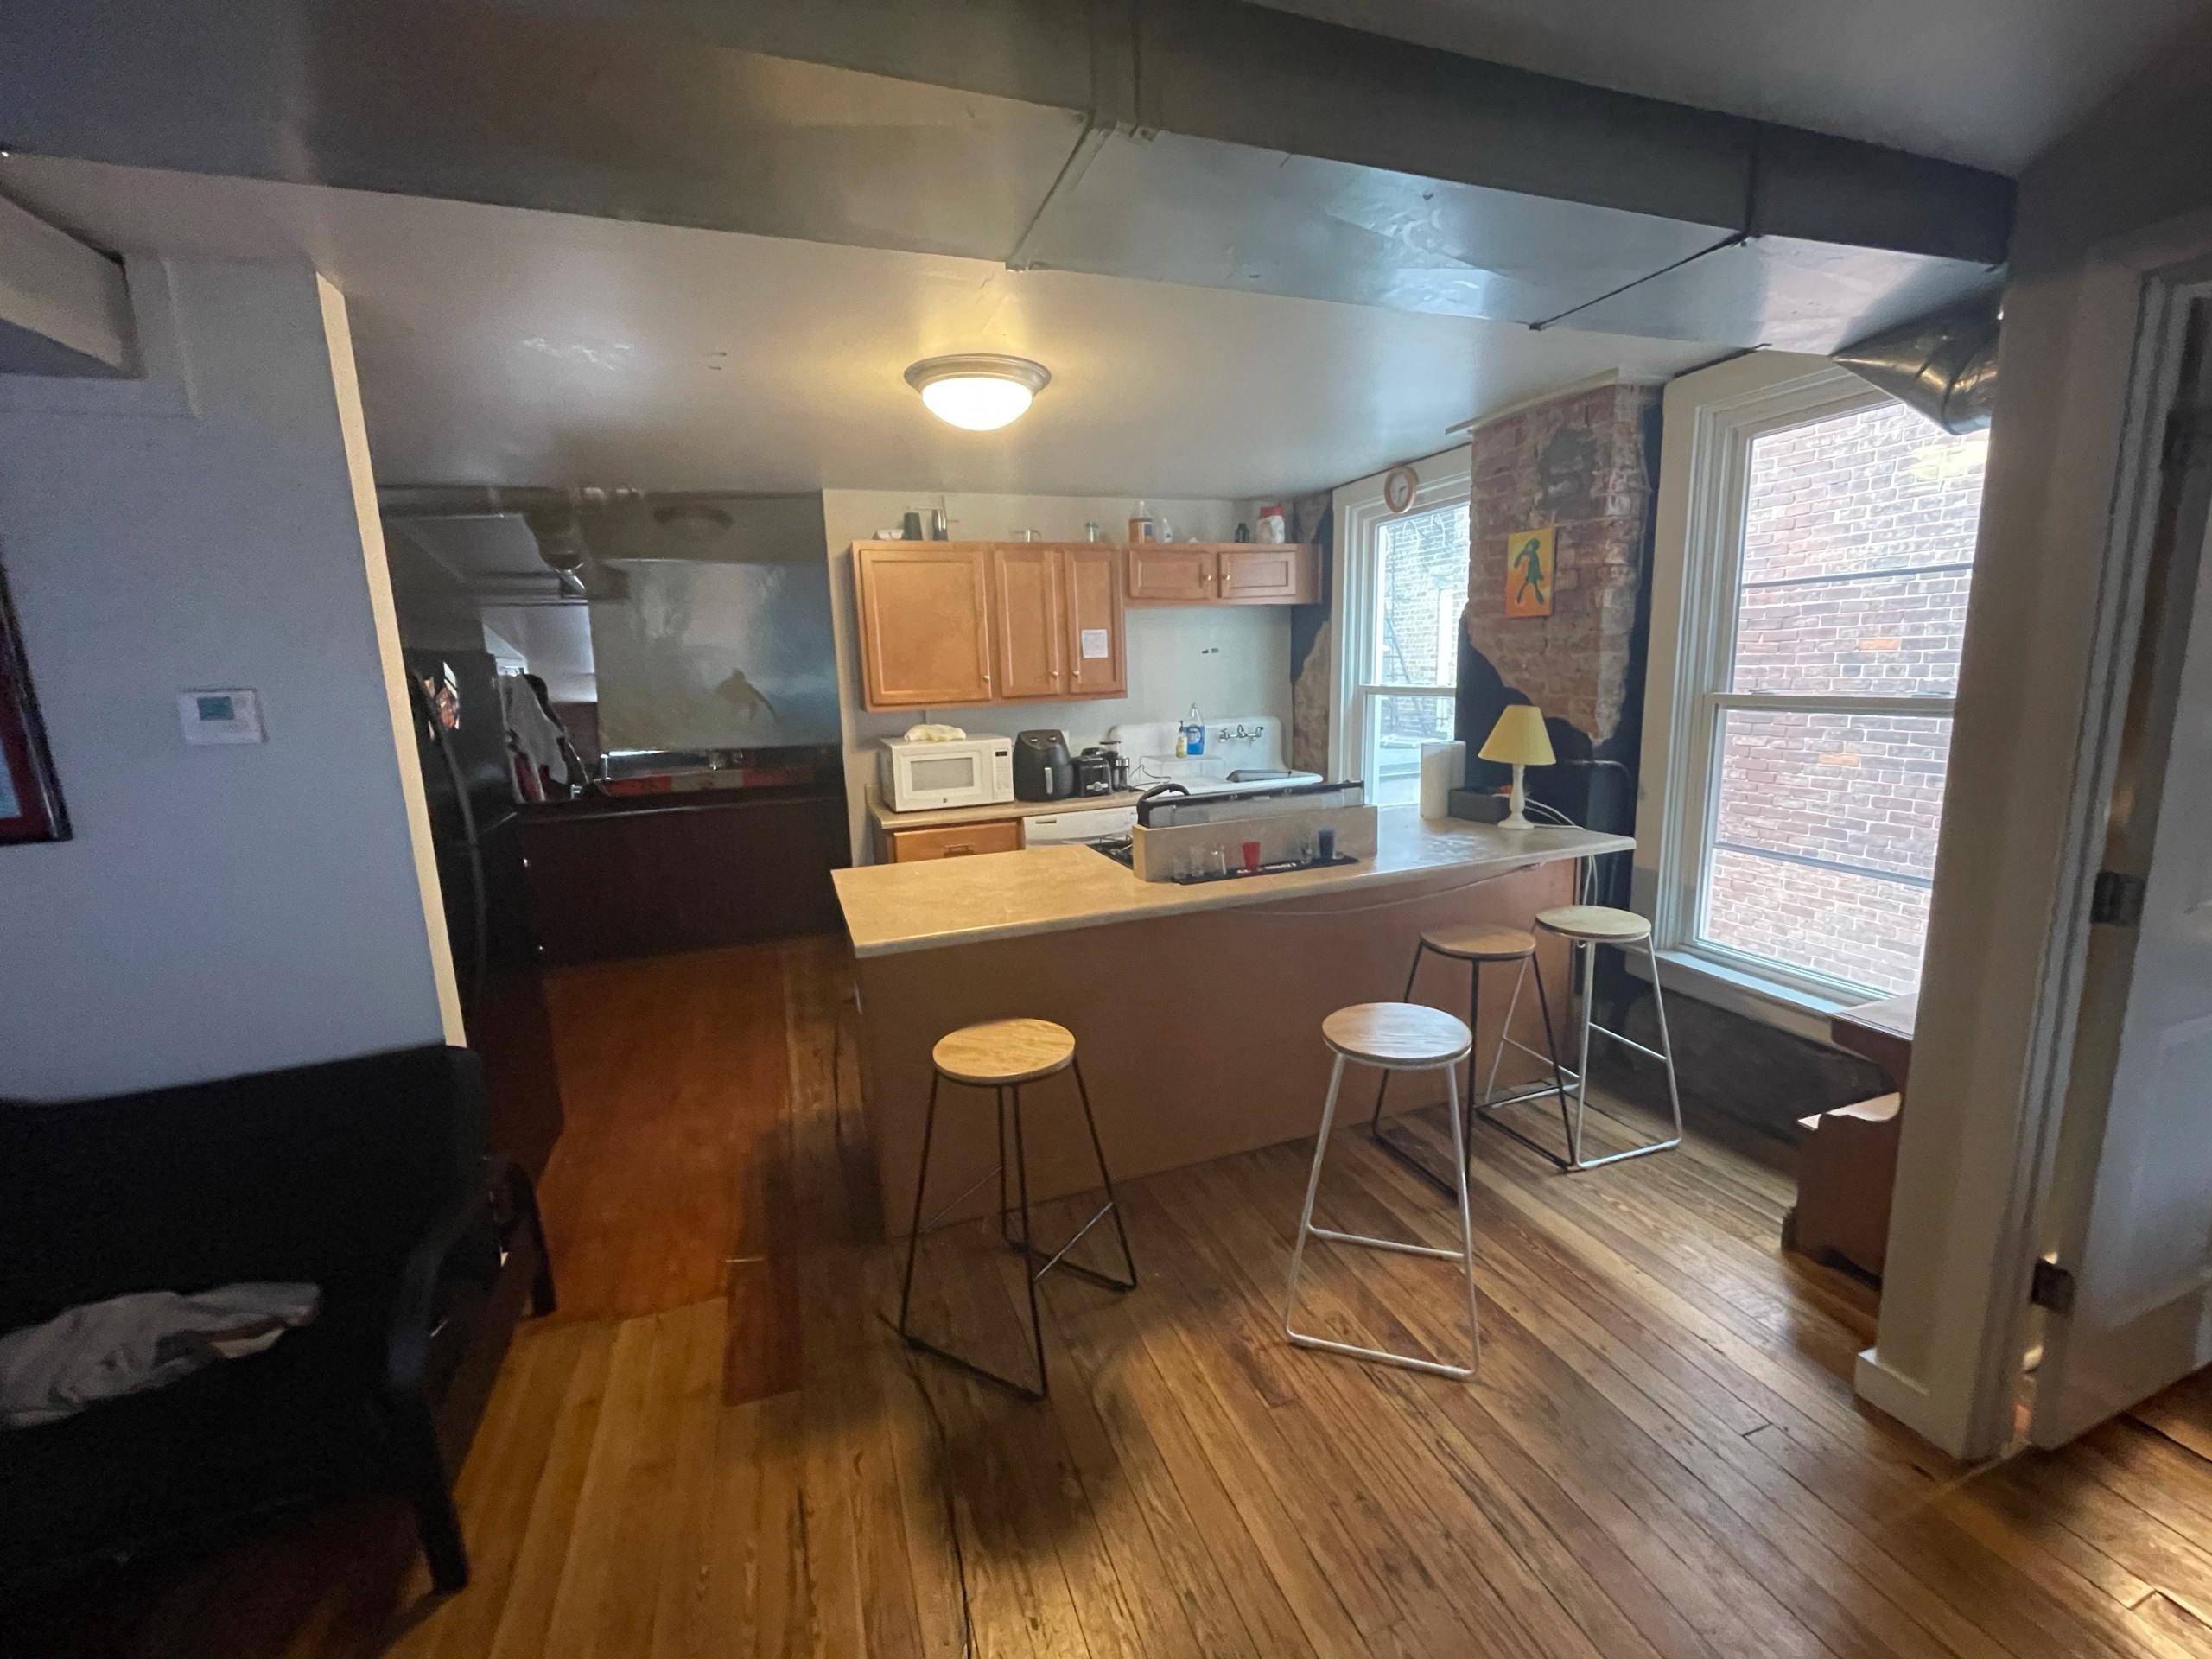 Apartments on rent - 226 W. McMillan -3